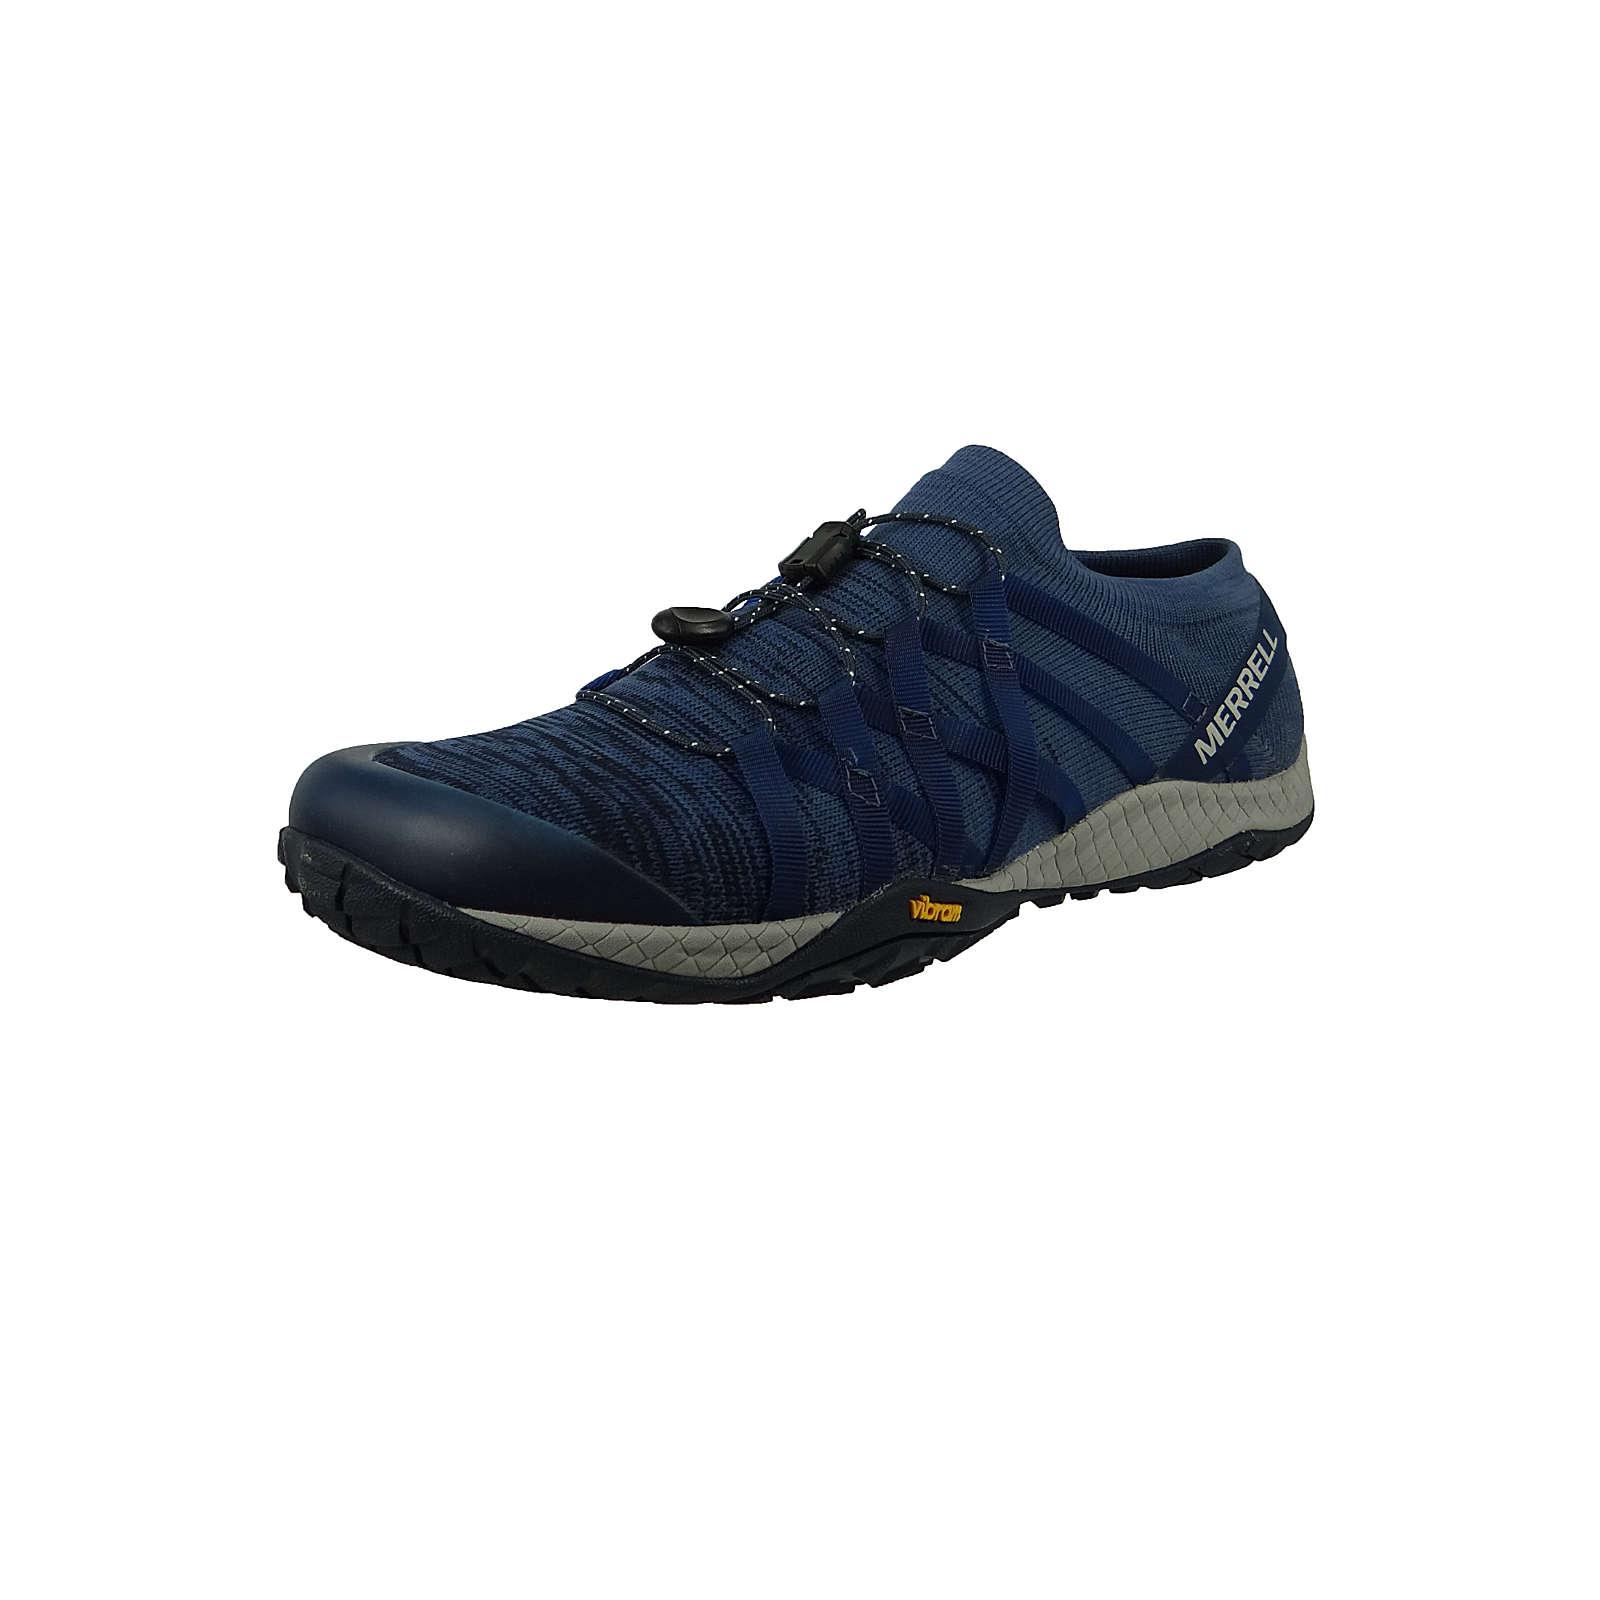 MERRELL Trailrunningschuhe blau Herren Gr. 42